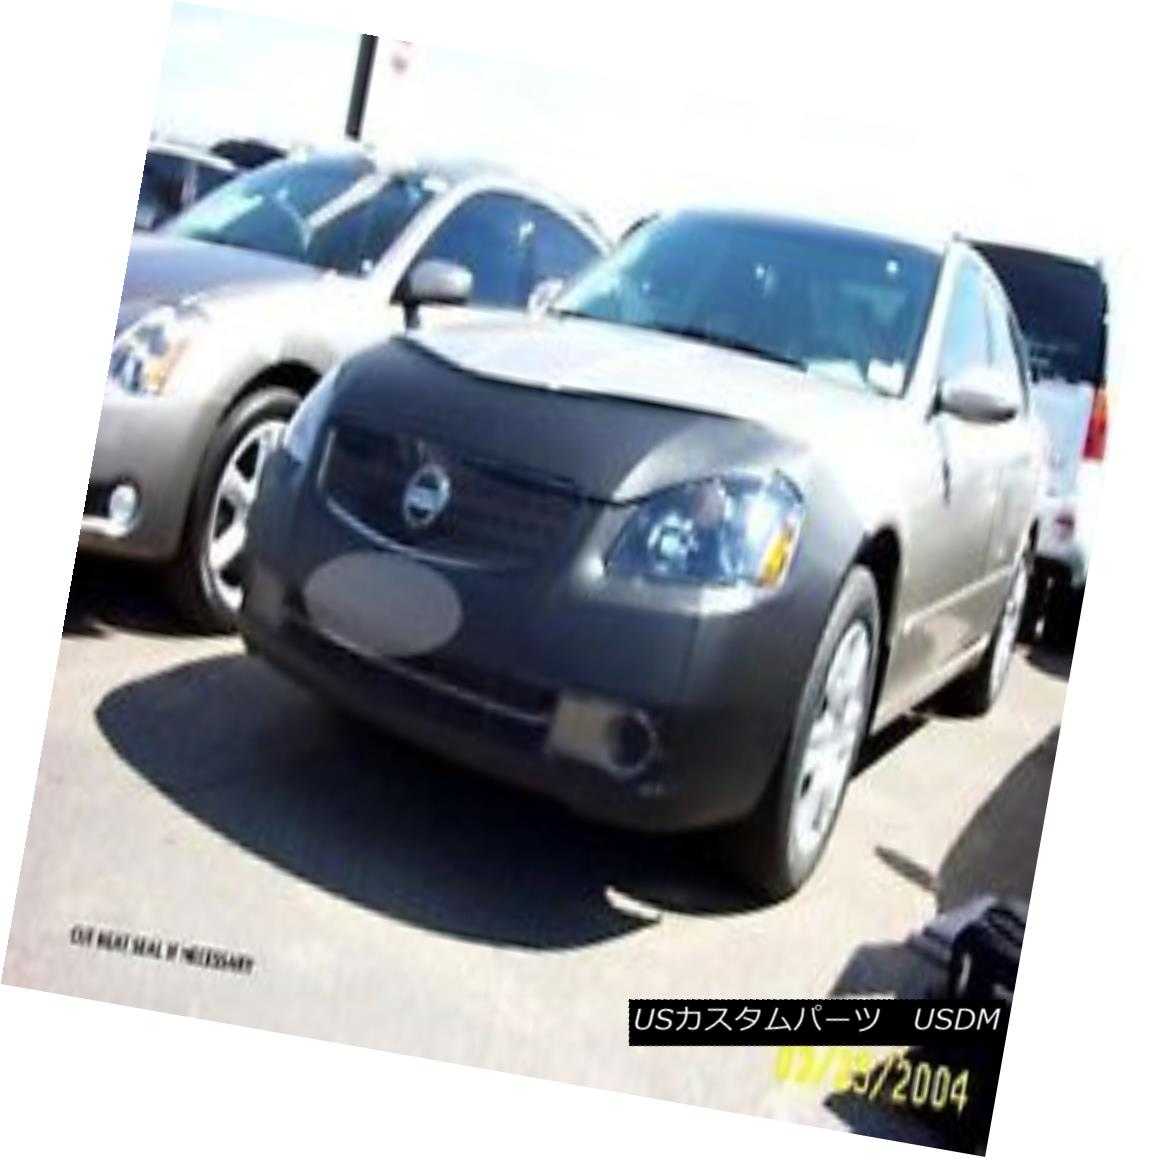 USフルブラ・USノーズブラ Lebra Front End Cover Mask Bra Fits Nissan Altima SE-R 2005-2006 LebraフロントエンドカバーマスクブラはNissan Altima SE-R 2005-2006に適合